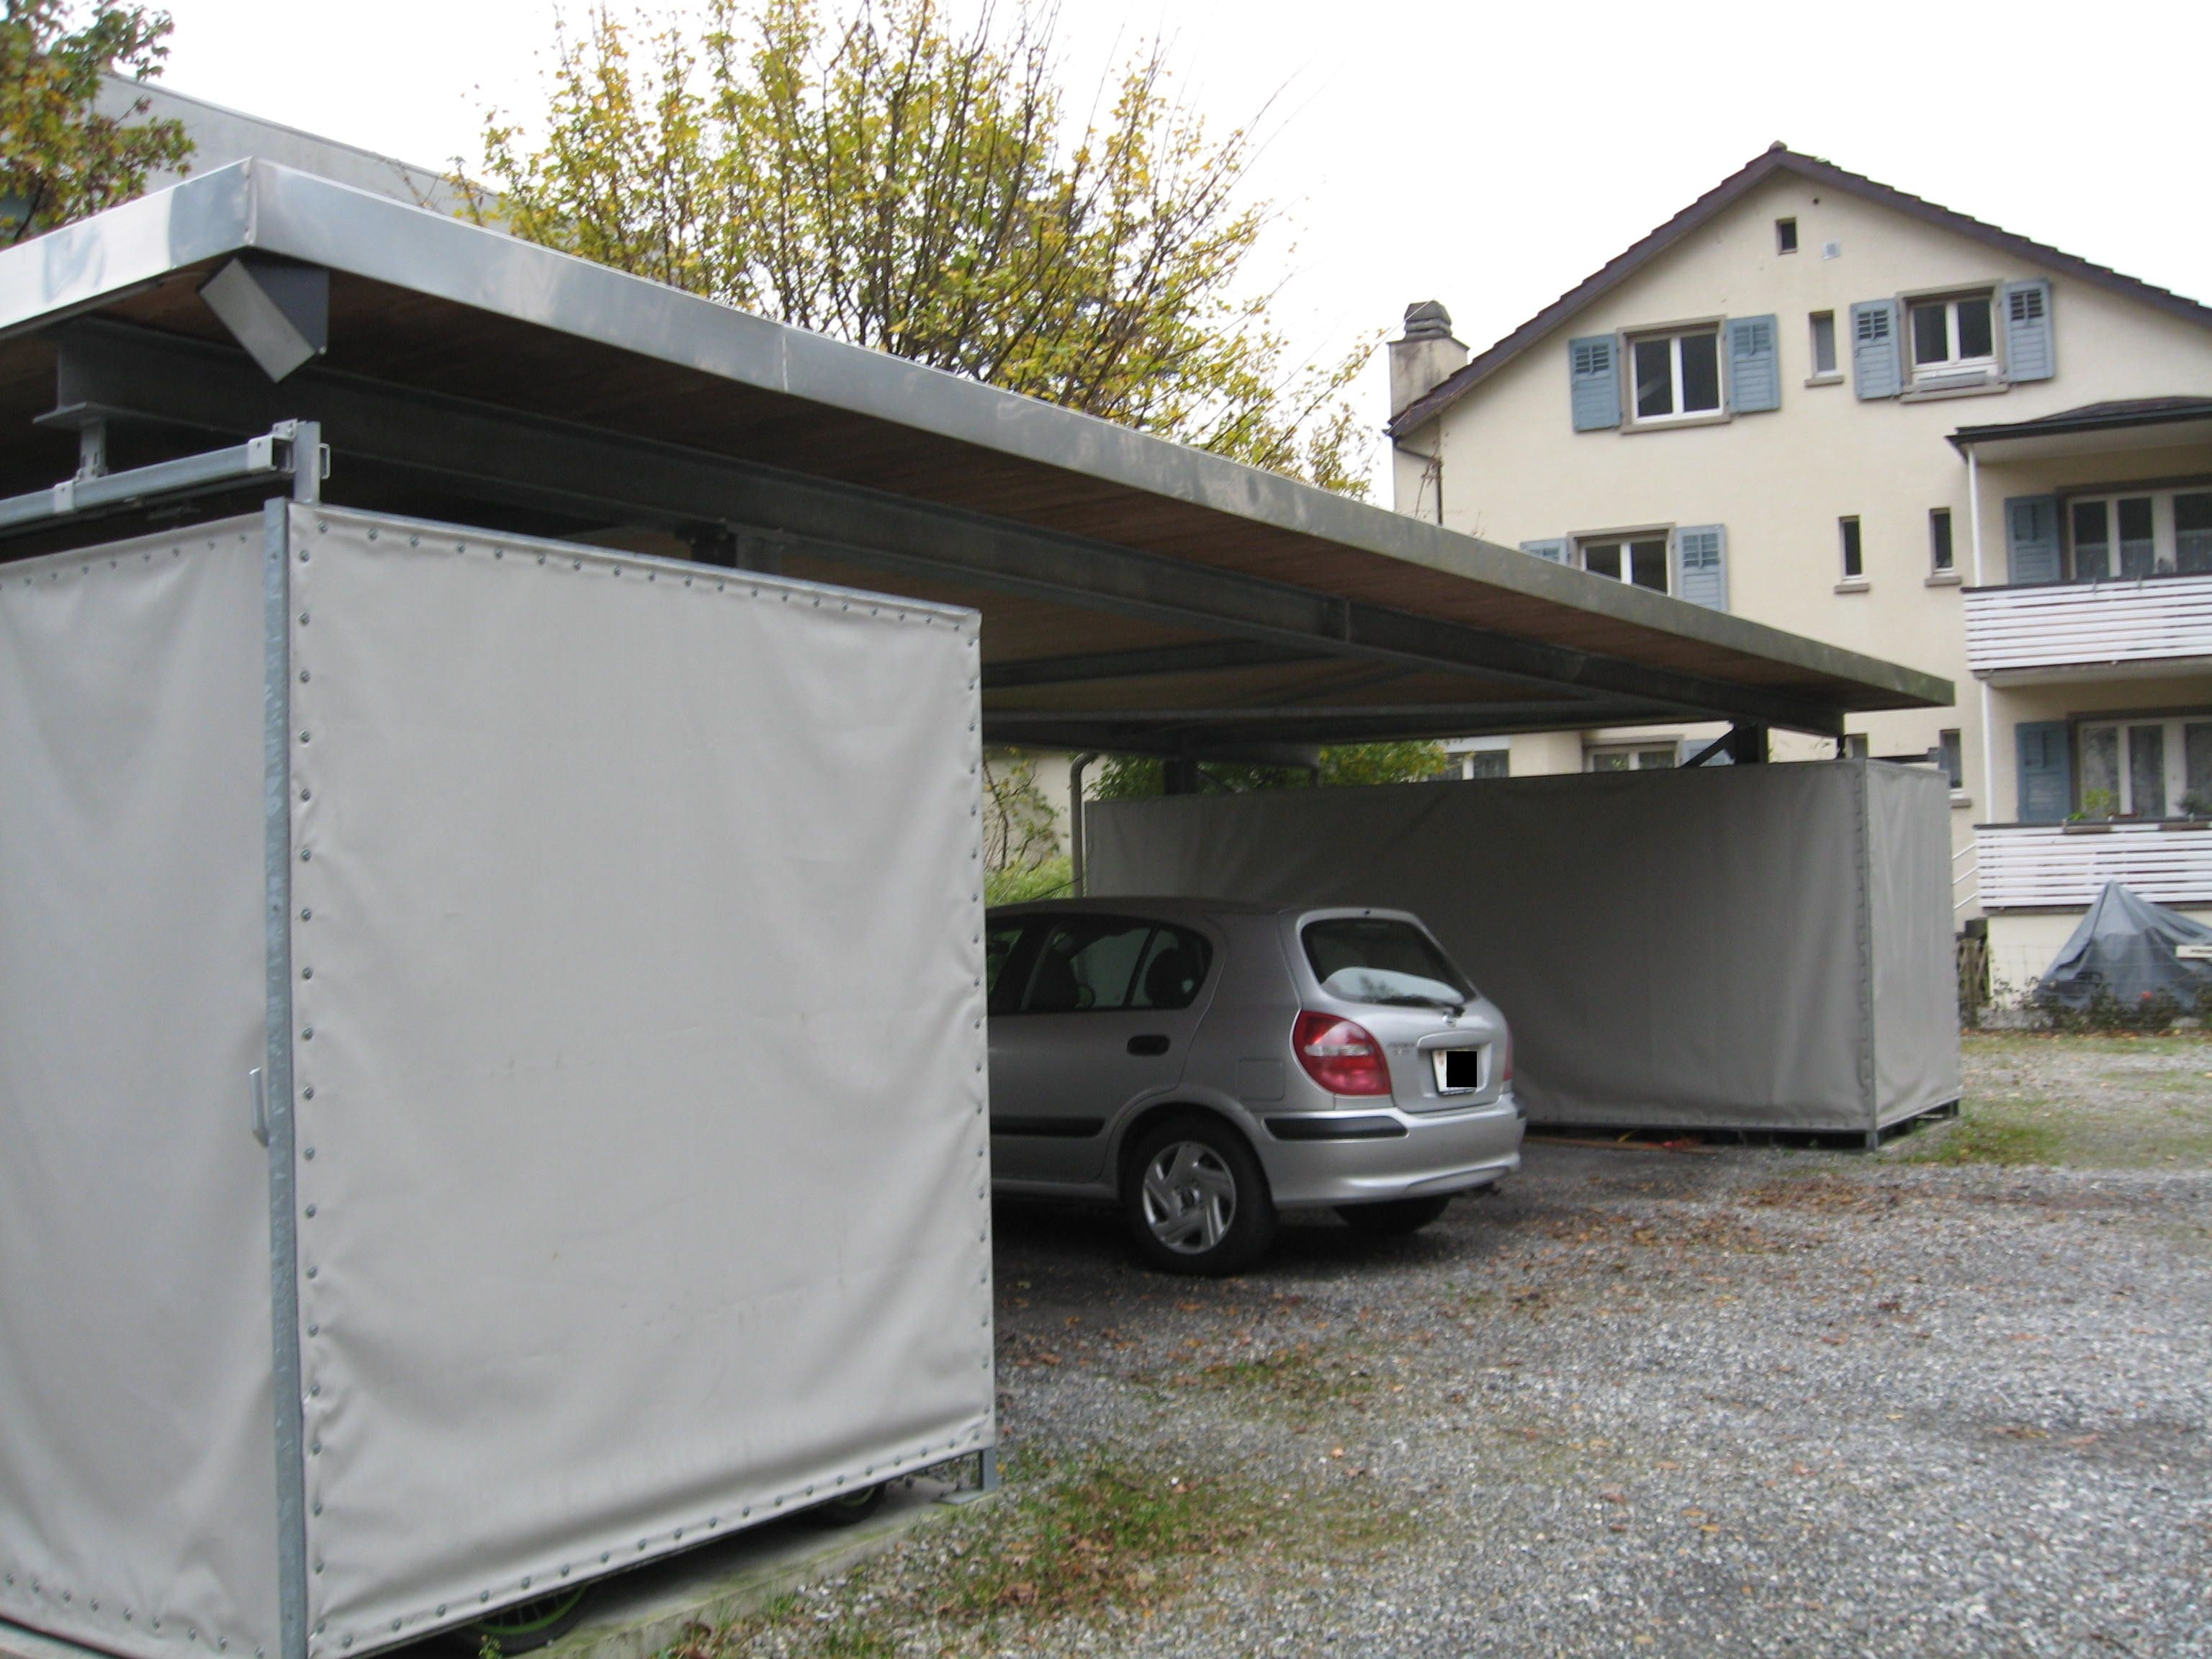 flachdach carport aus stahl mit 2 ger teschuppen f r 3 autos carport flachdach. Black Bedroom Furniture Sets. Home Design Ideas